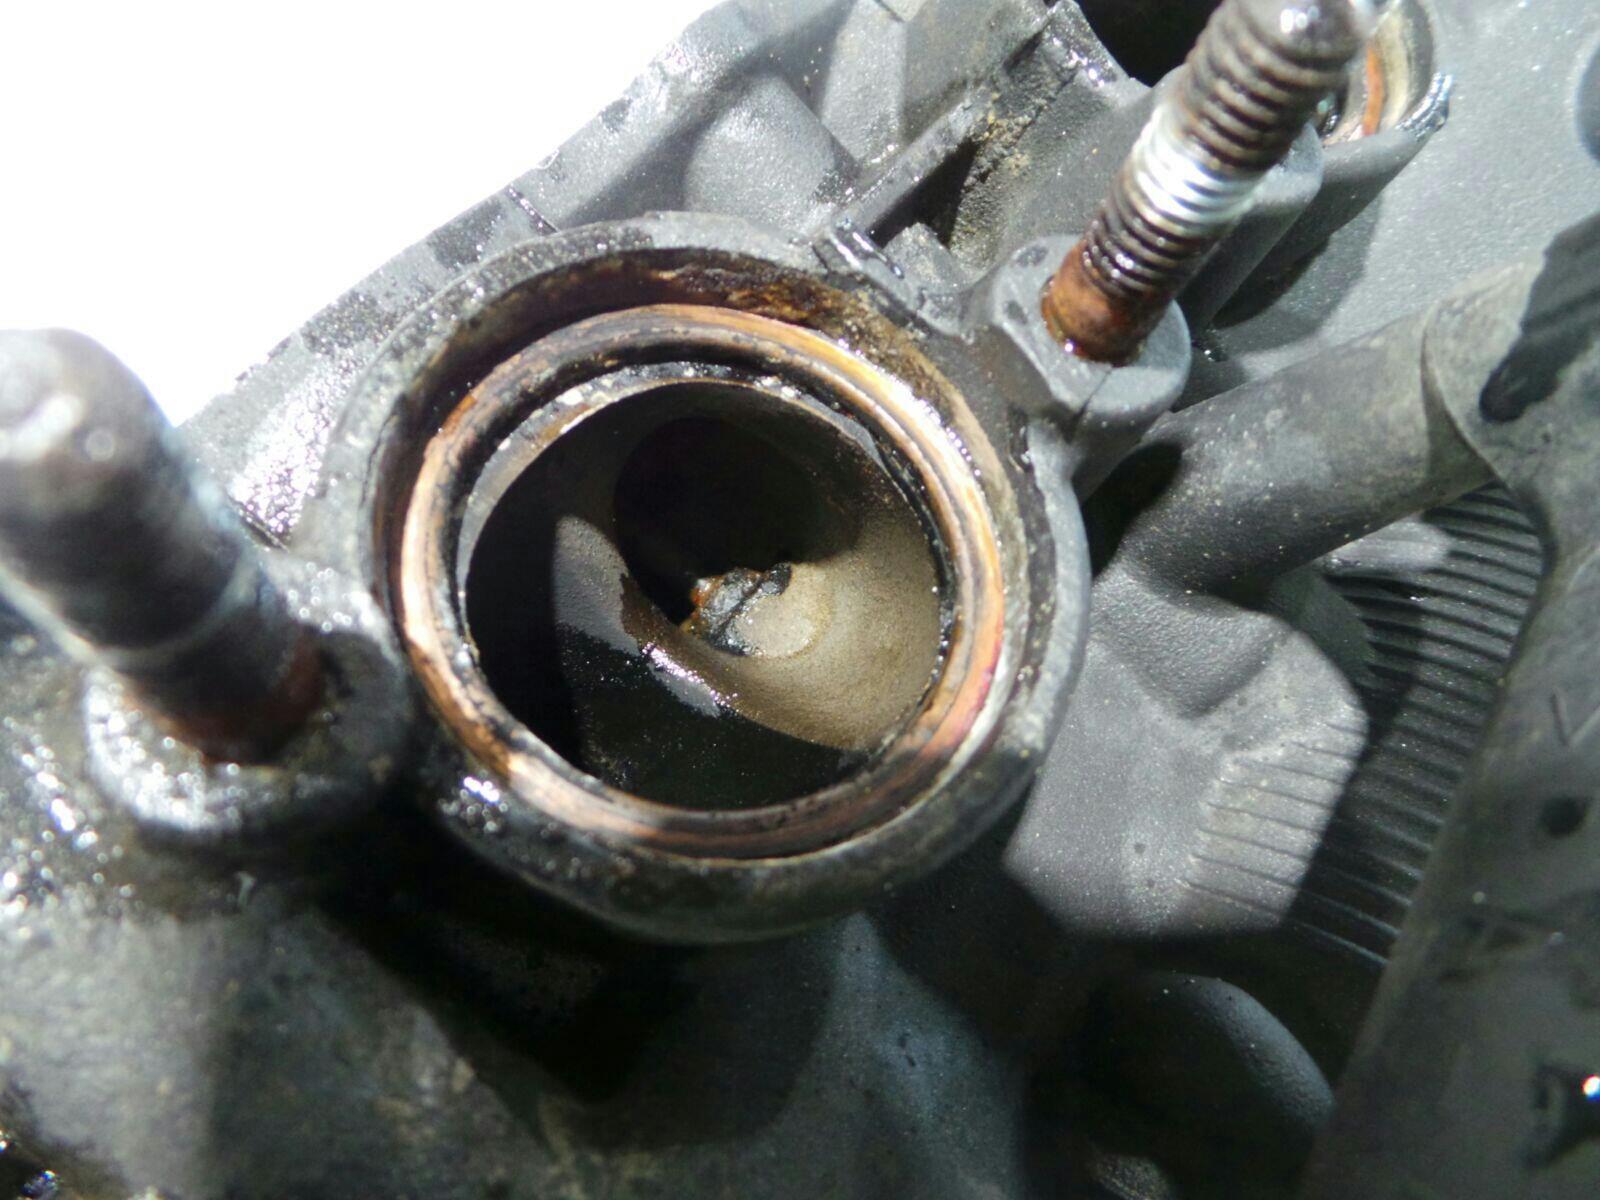 Yamaha YzfR1 2009 To 2014 Engine Cylinder Head (Petrol